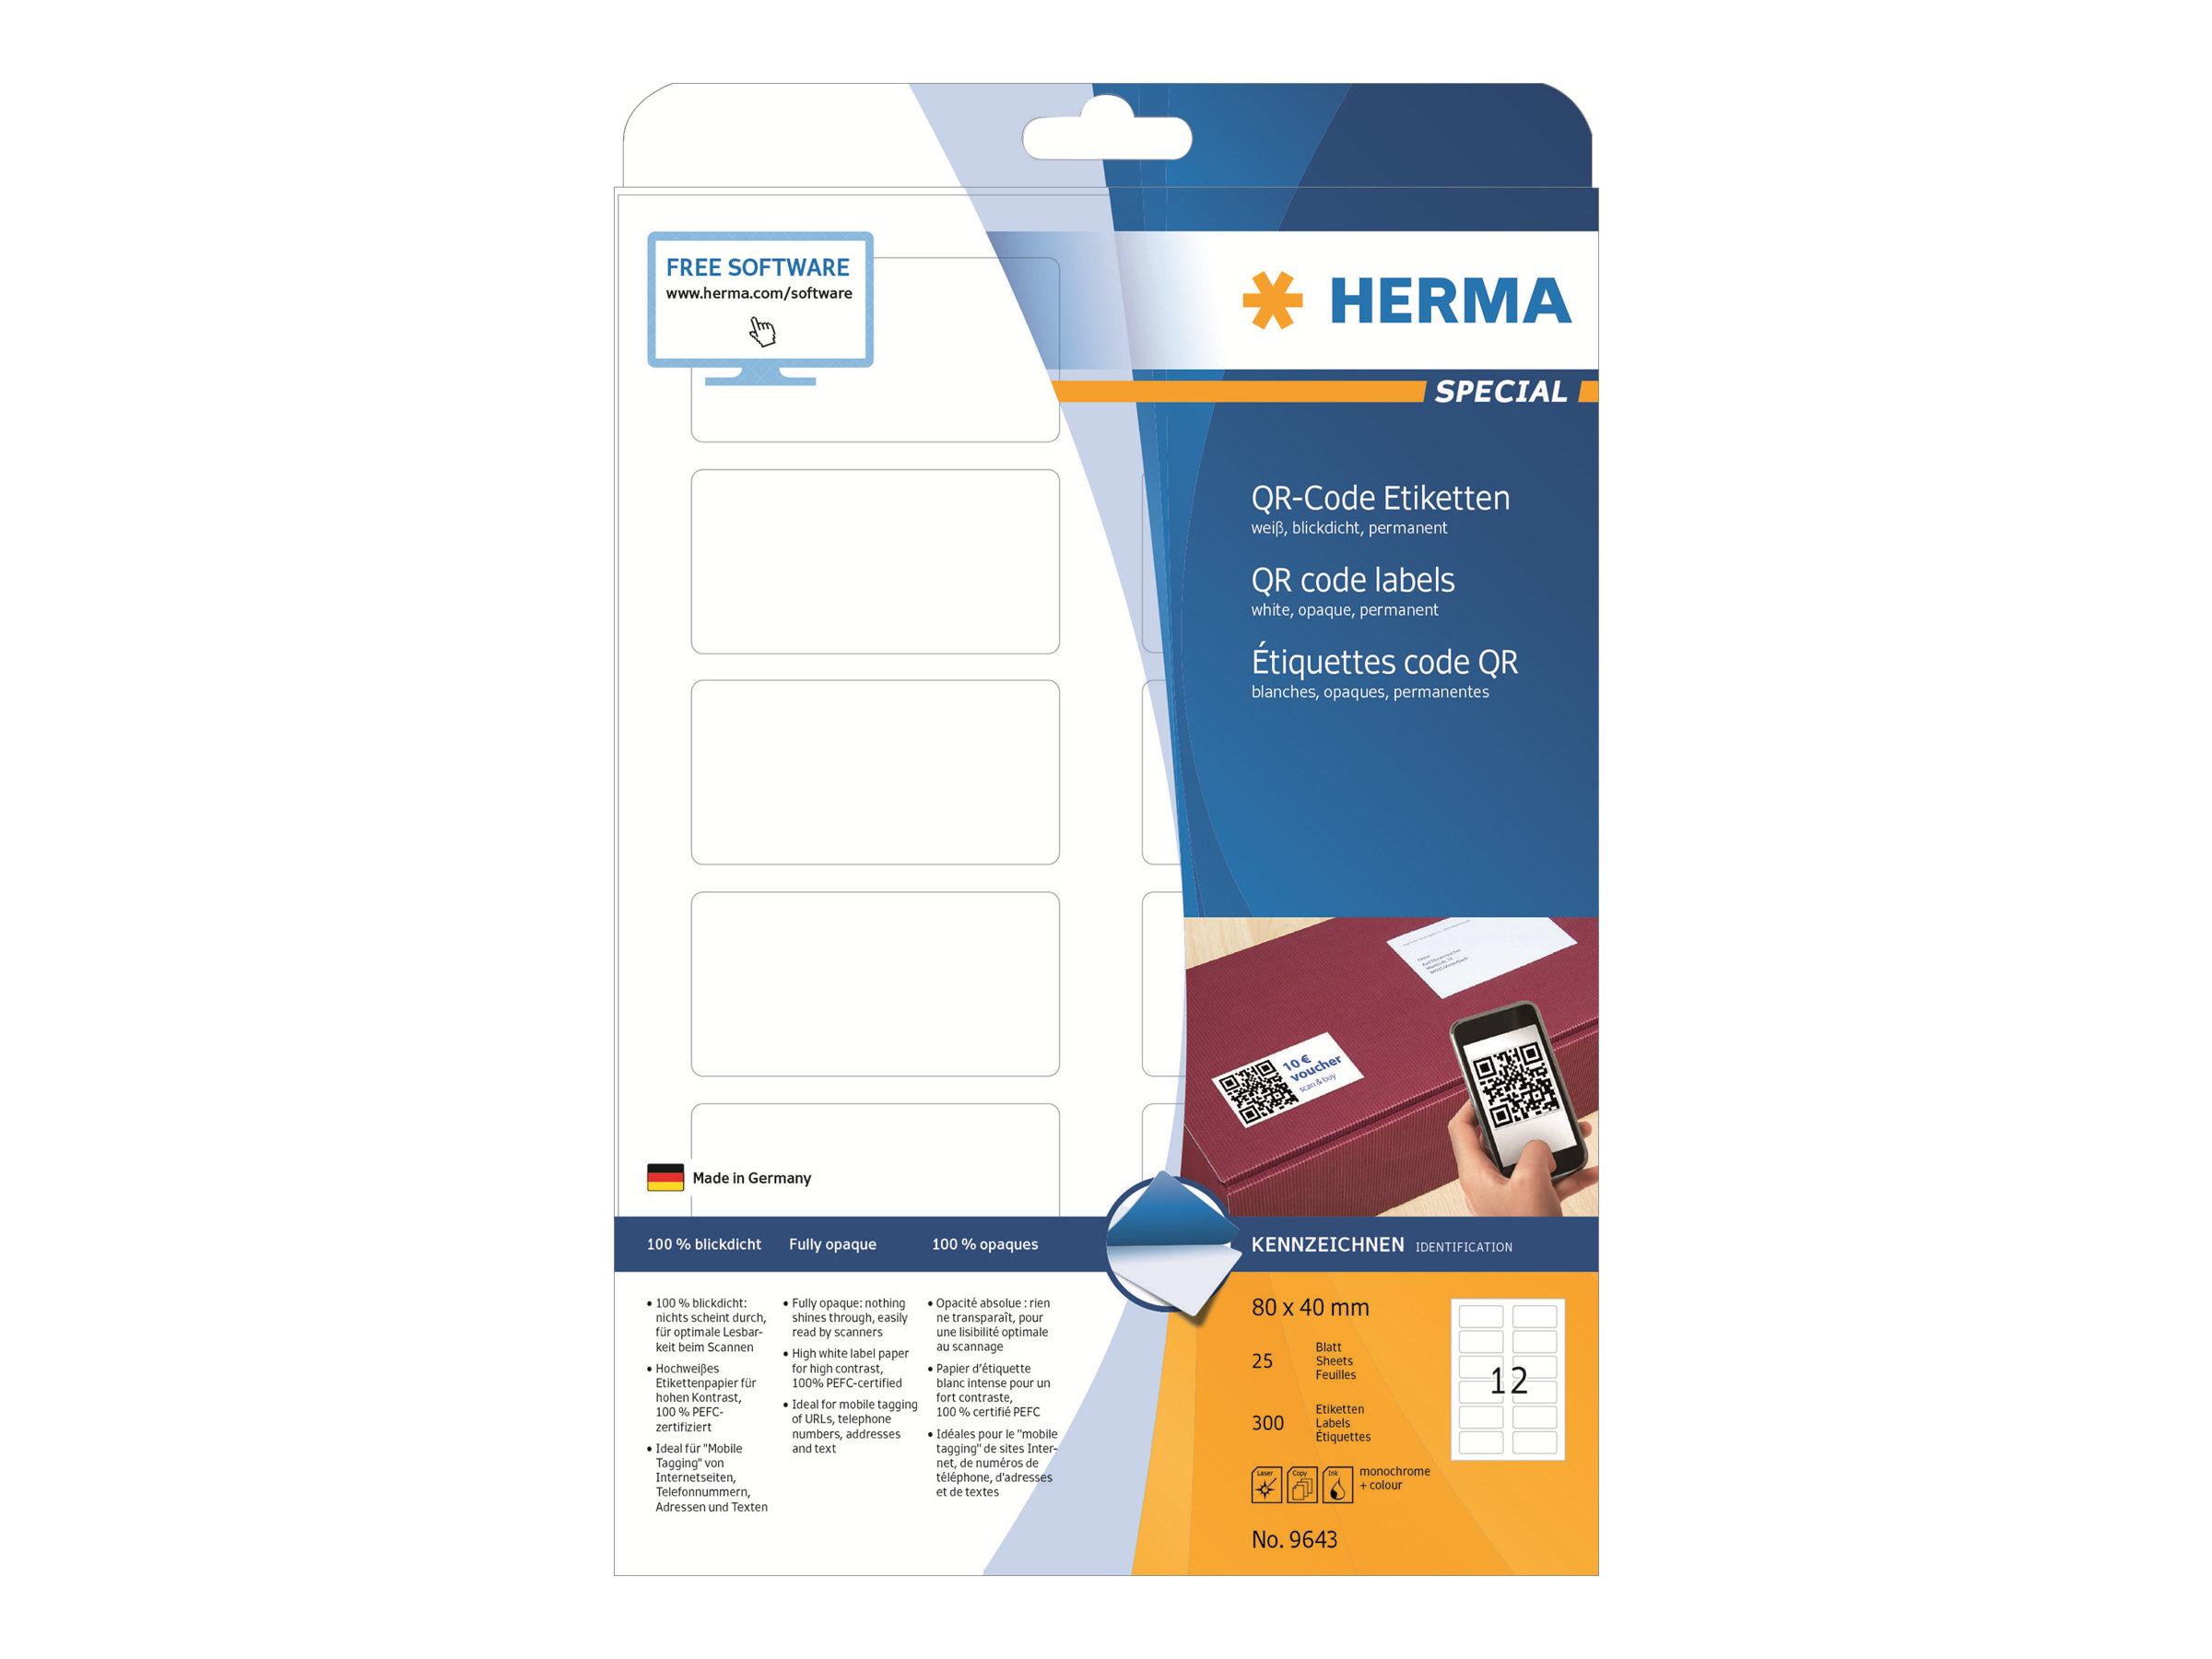 HERMA Special - Papier - matt - permanent selbstklebend - weiß - 80 x 40 mm 300 Etikett(en) (25 Bogen x 12)